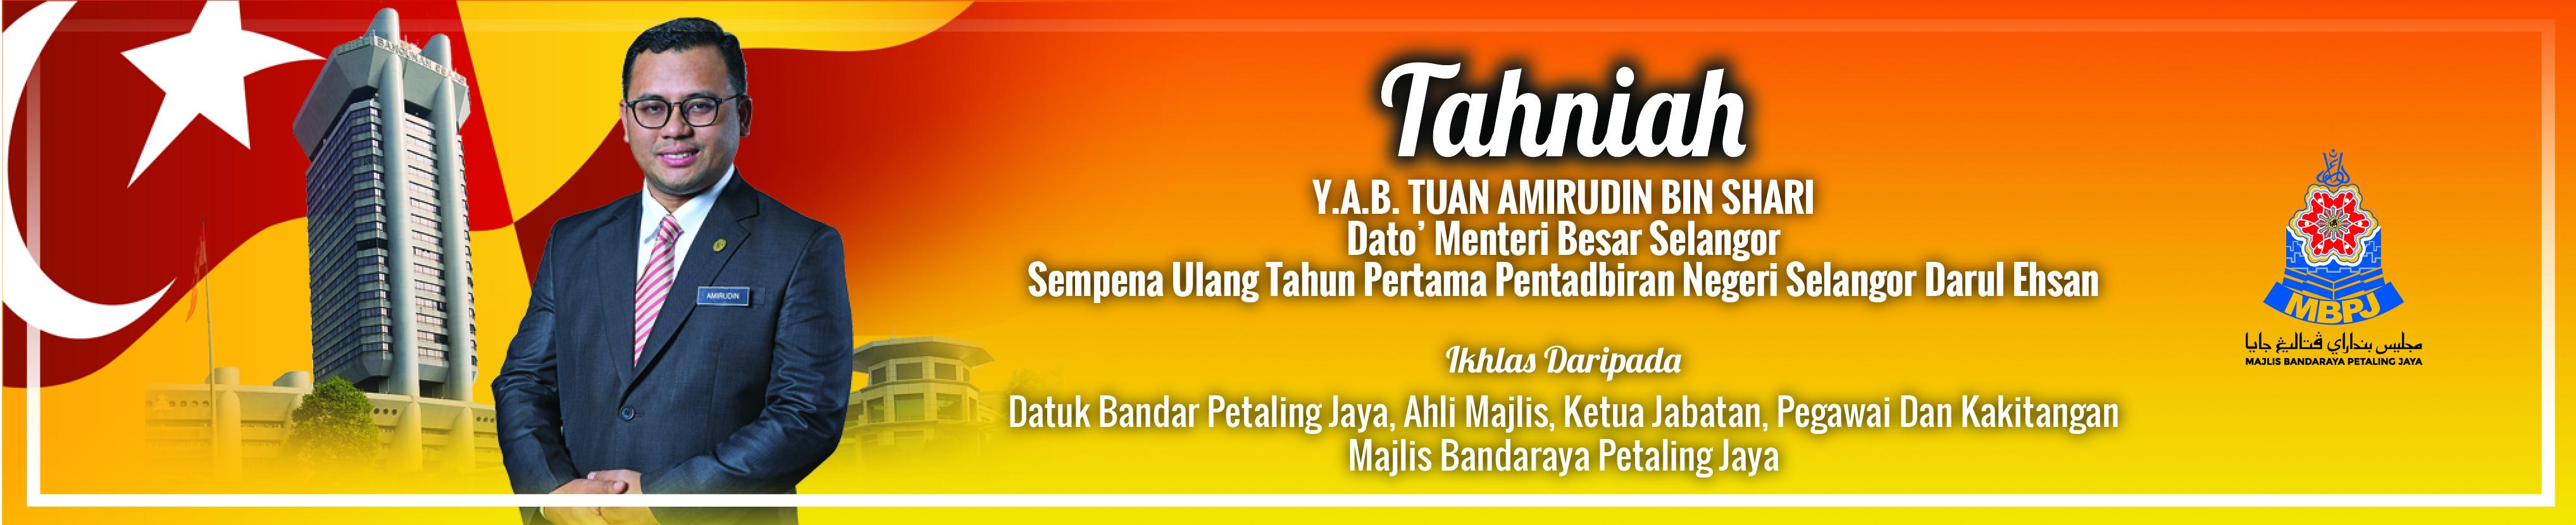 Banner Tahniah MB Selangor